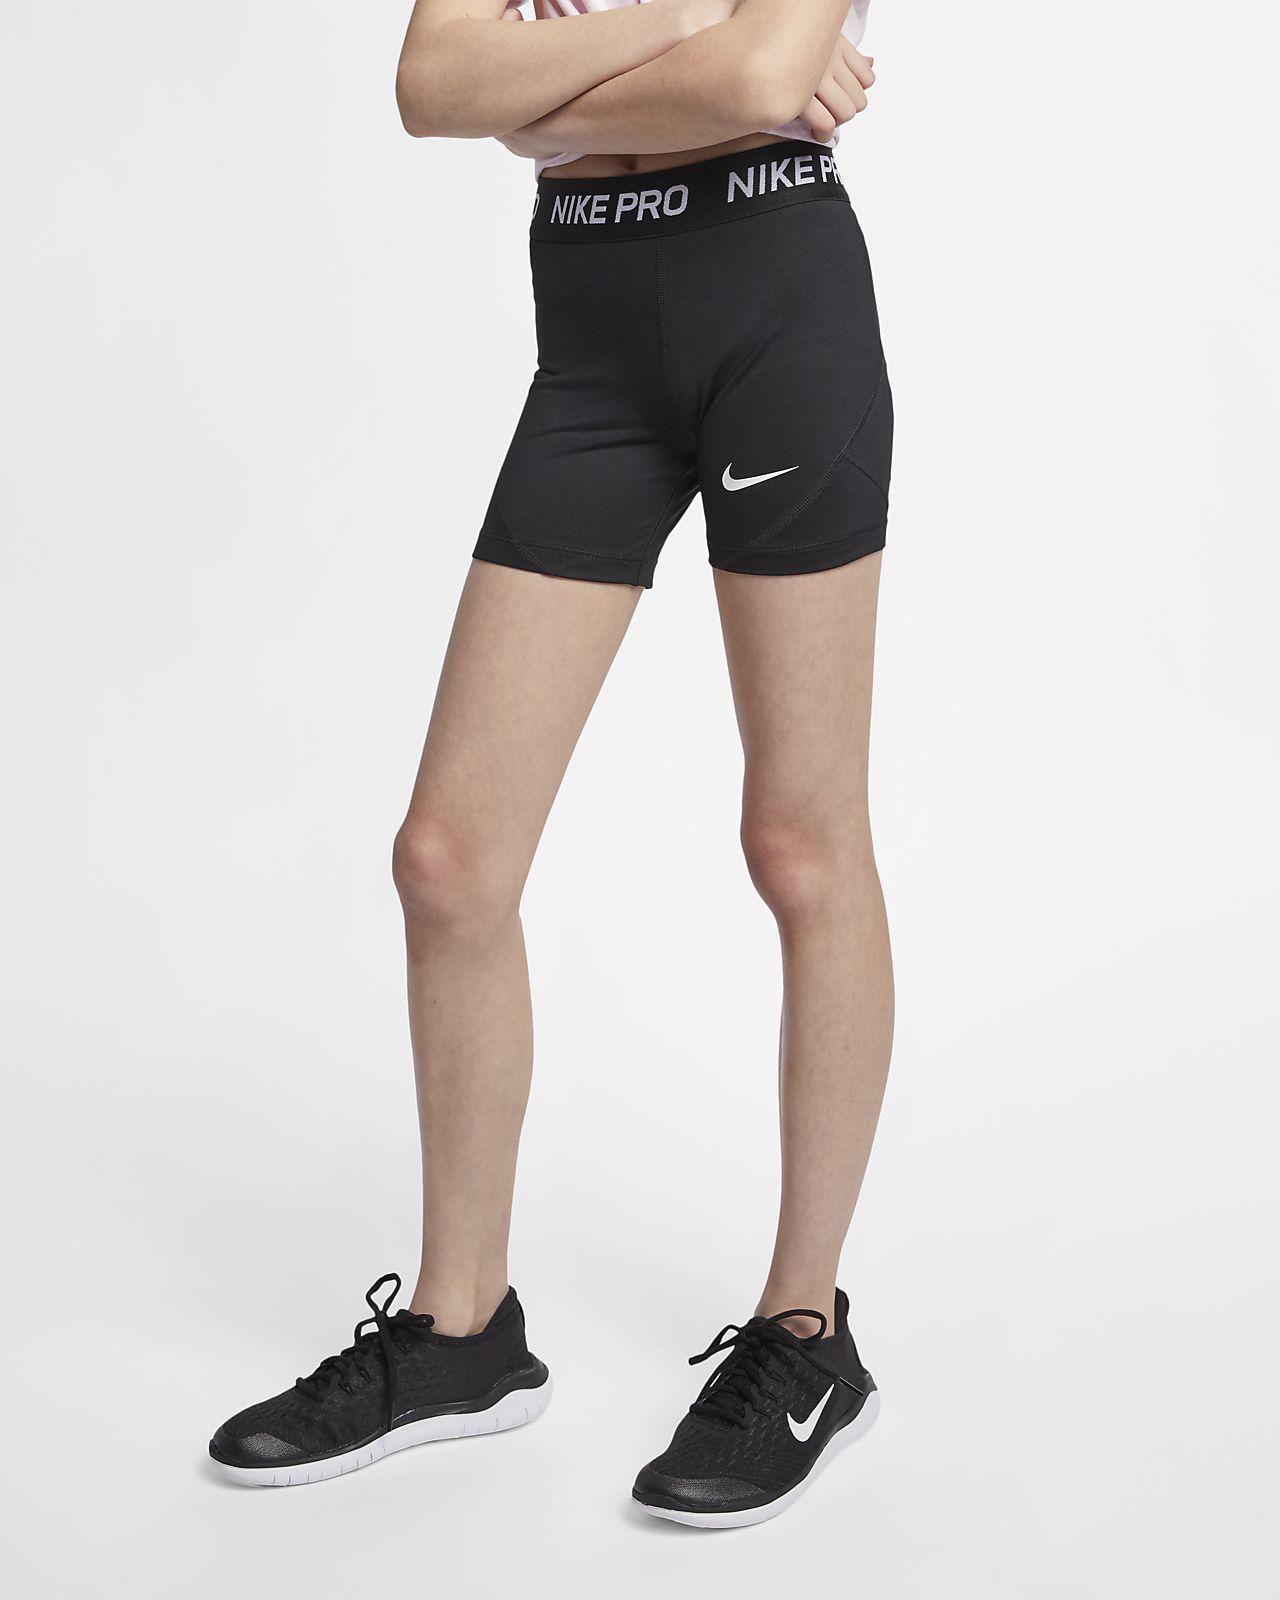 Pantaloncini Nike Pro Ragazza